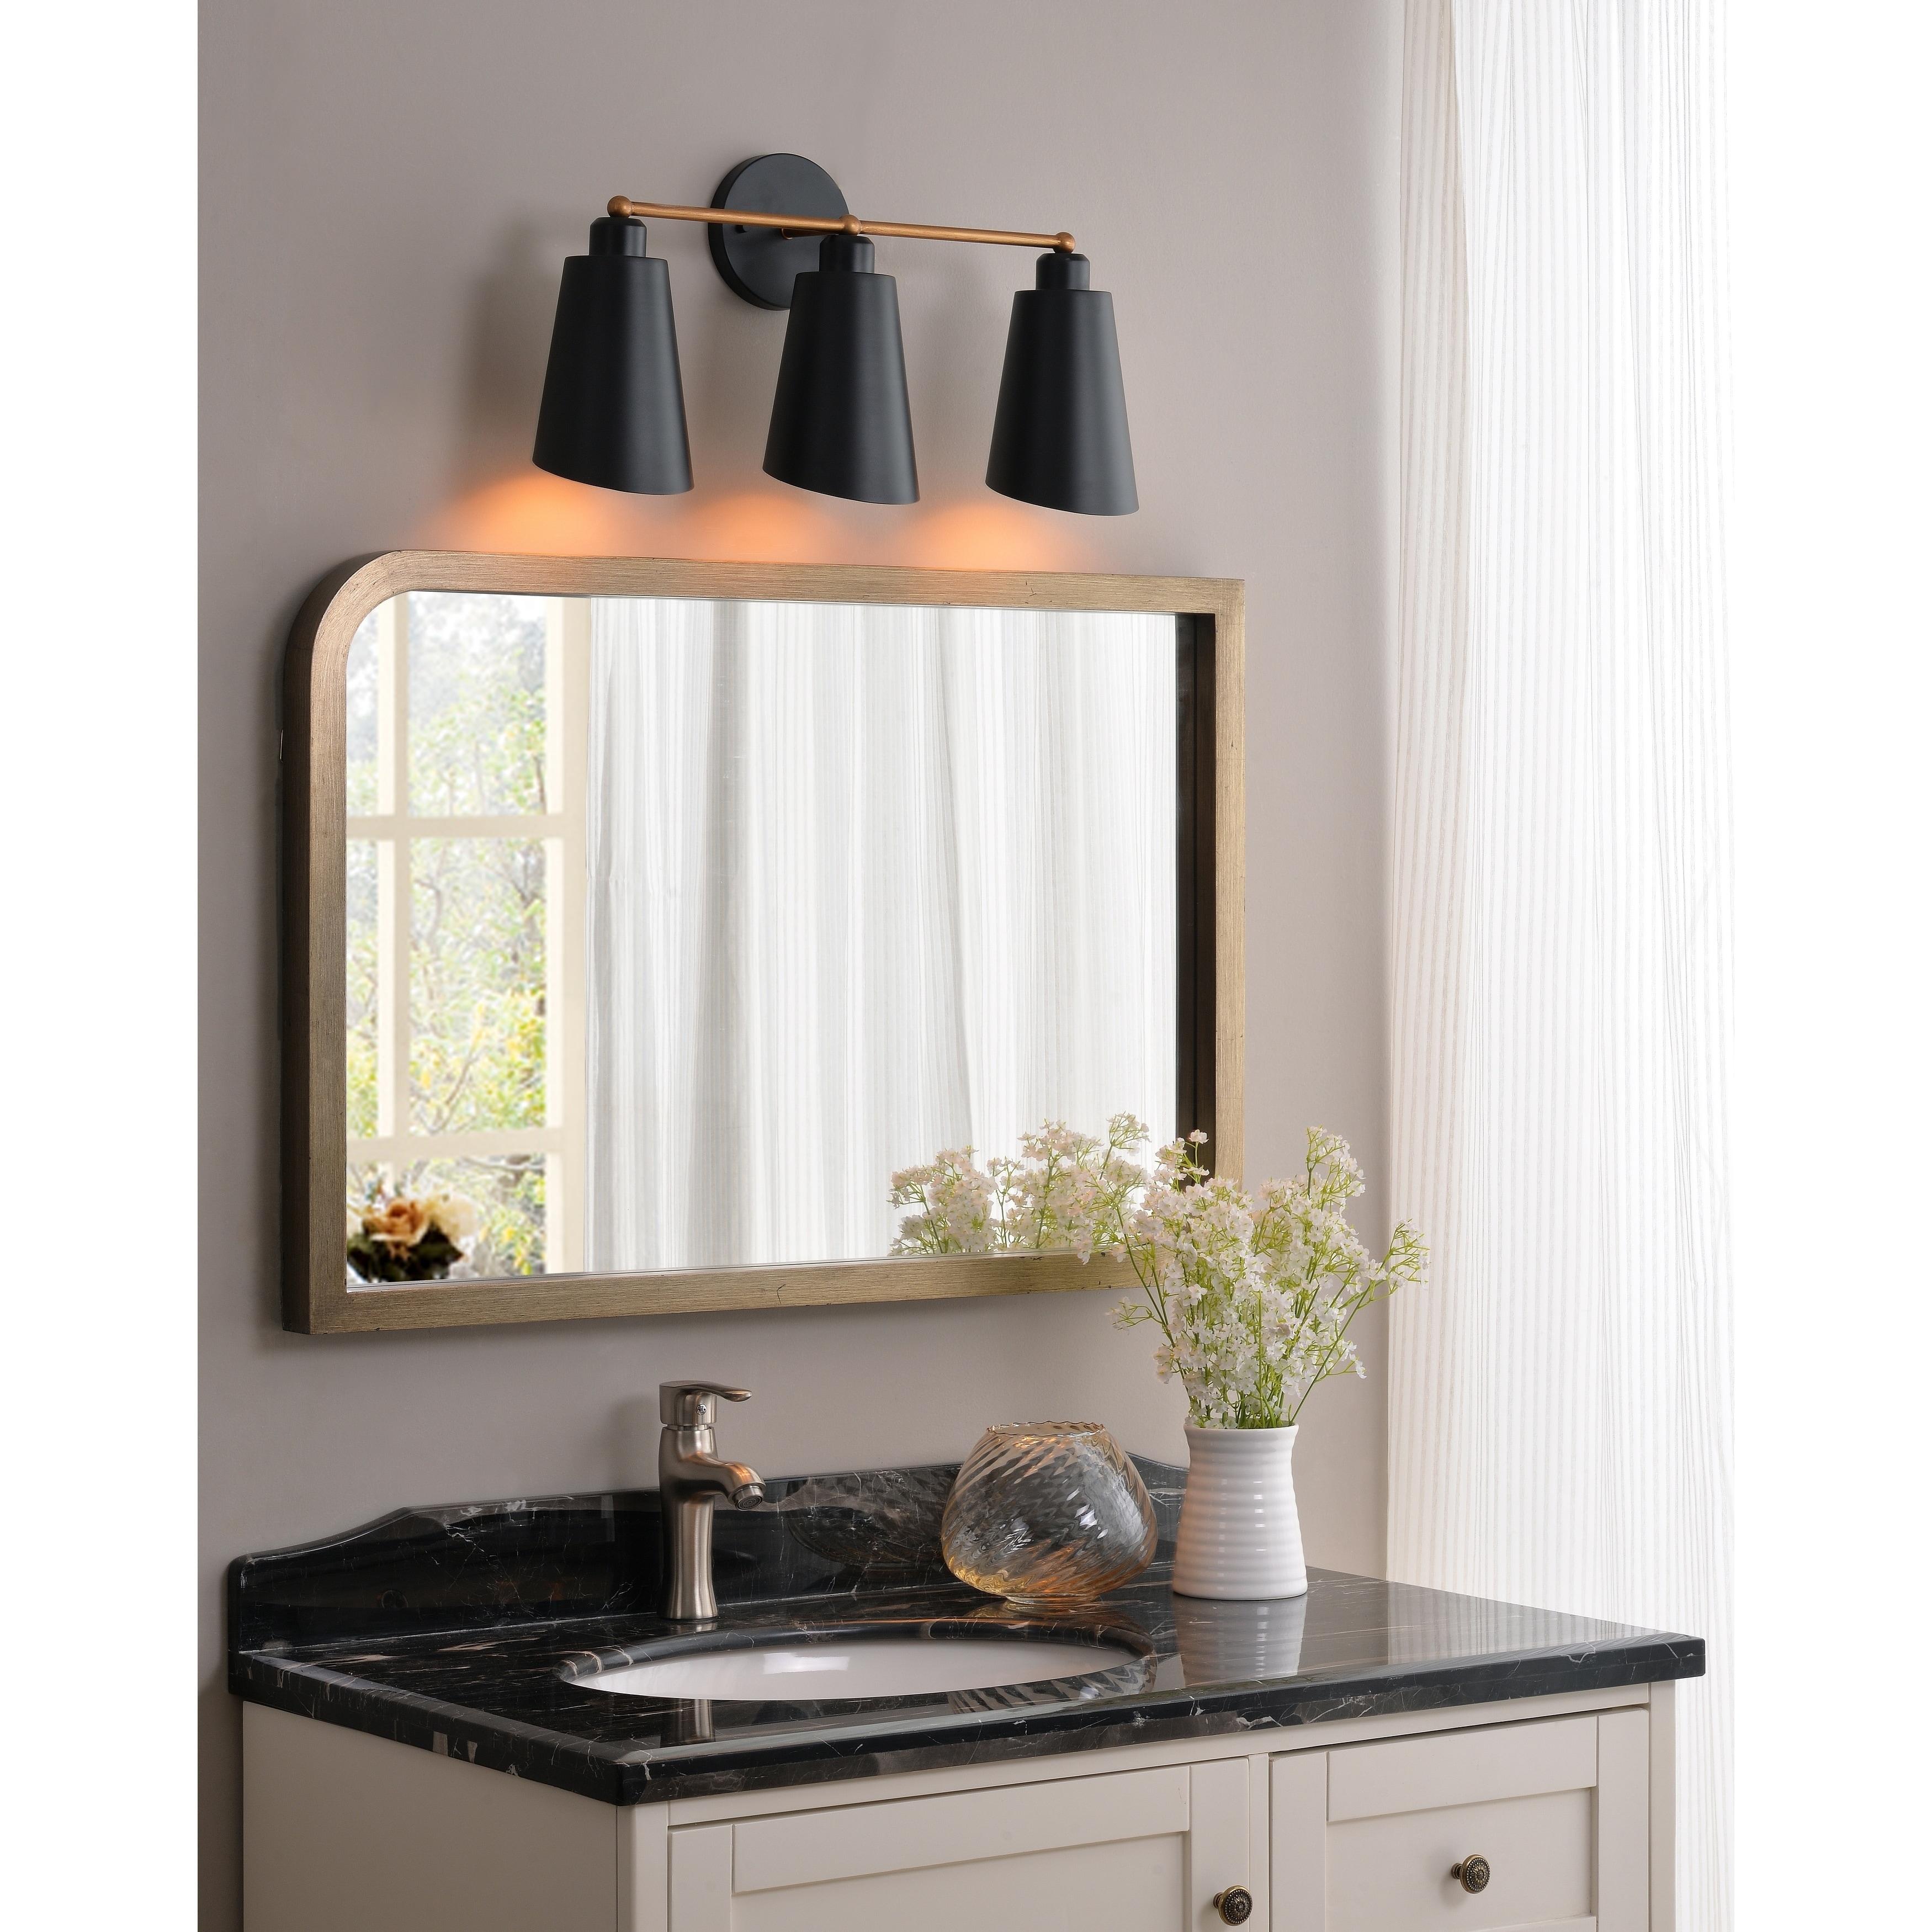 Image of: Shop Black Friday Deals On Brady 3 Light Vanity Matte Black With Gold On Sale Overstock 21725121